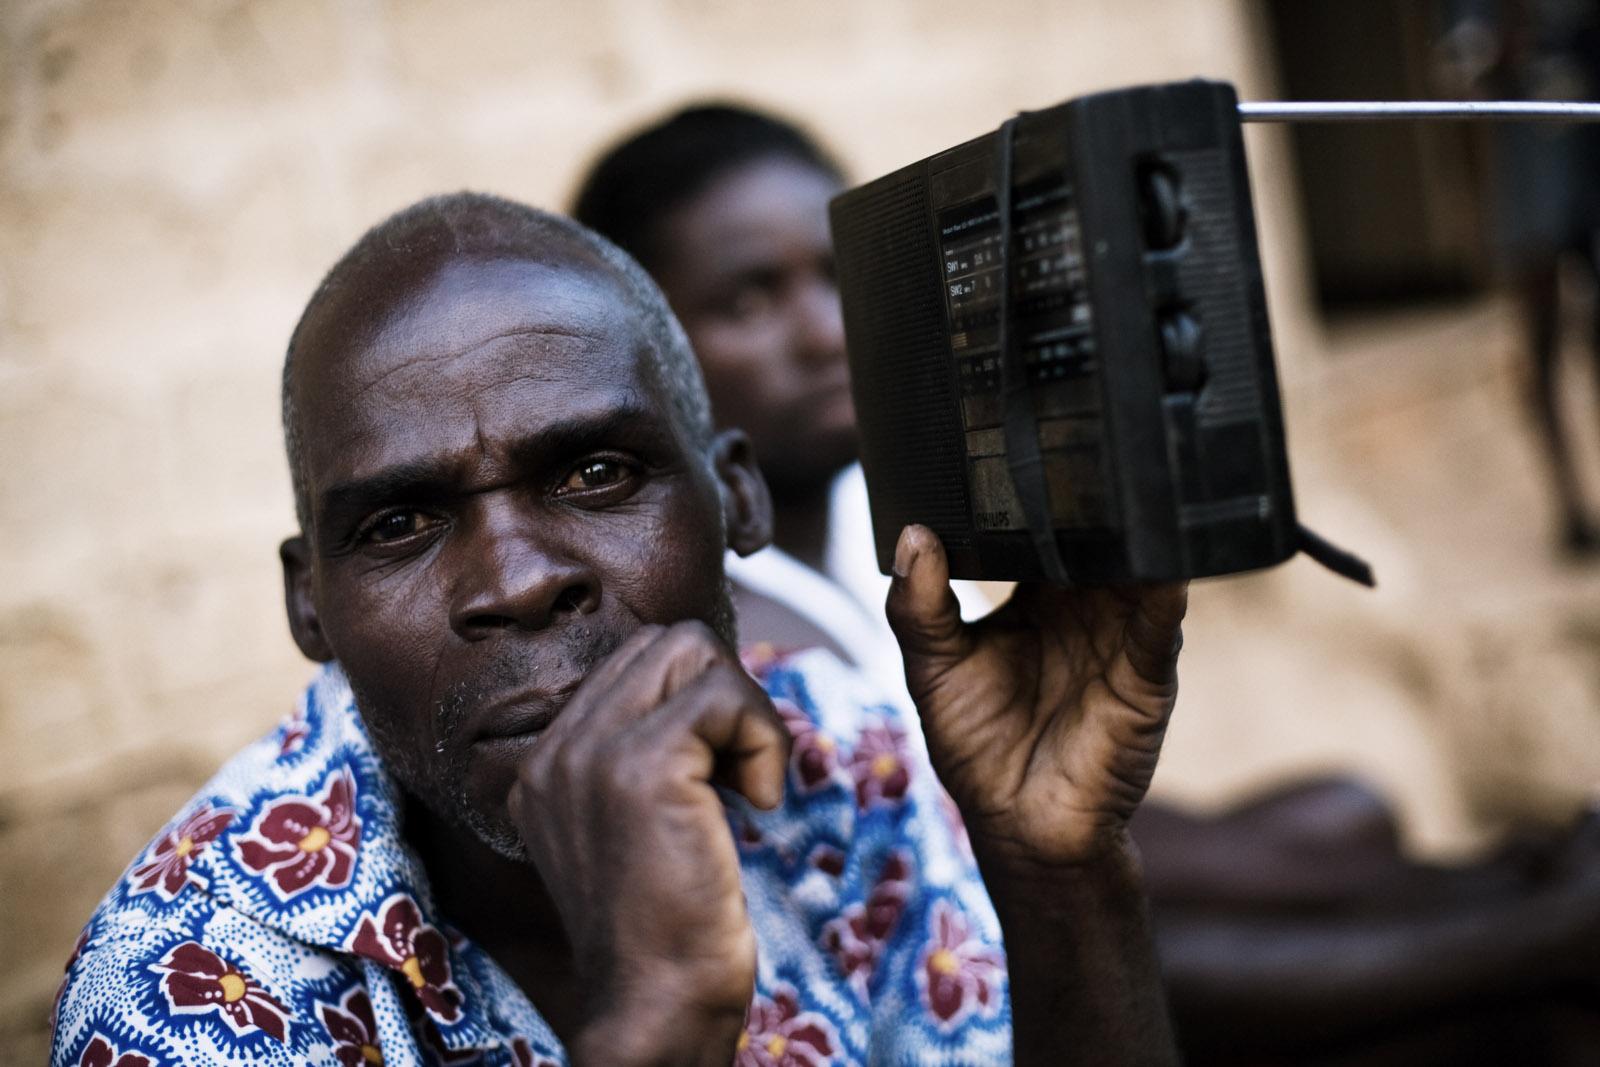 liberia-refugies-ivoiriens-0311-0291hd